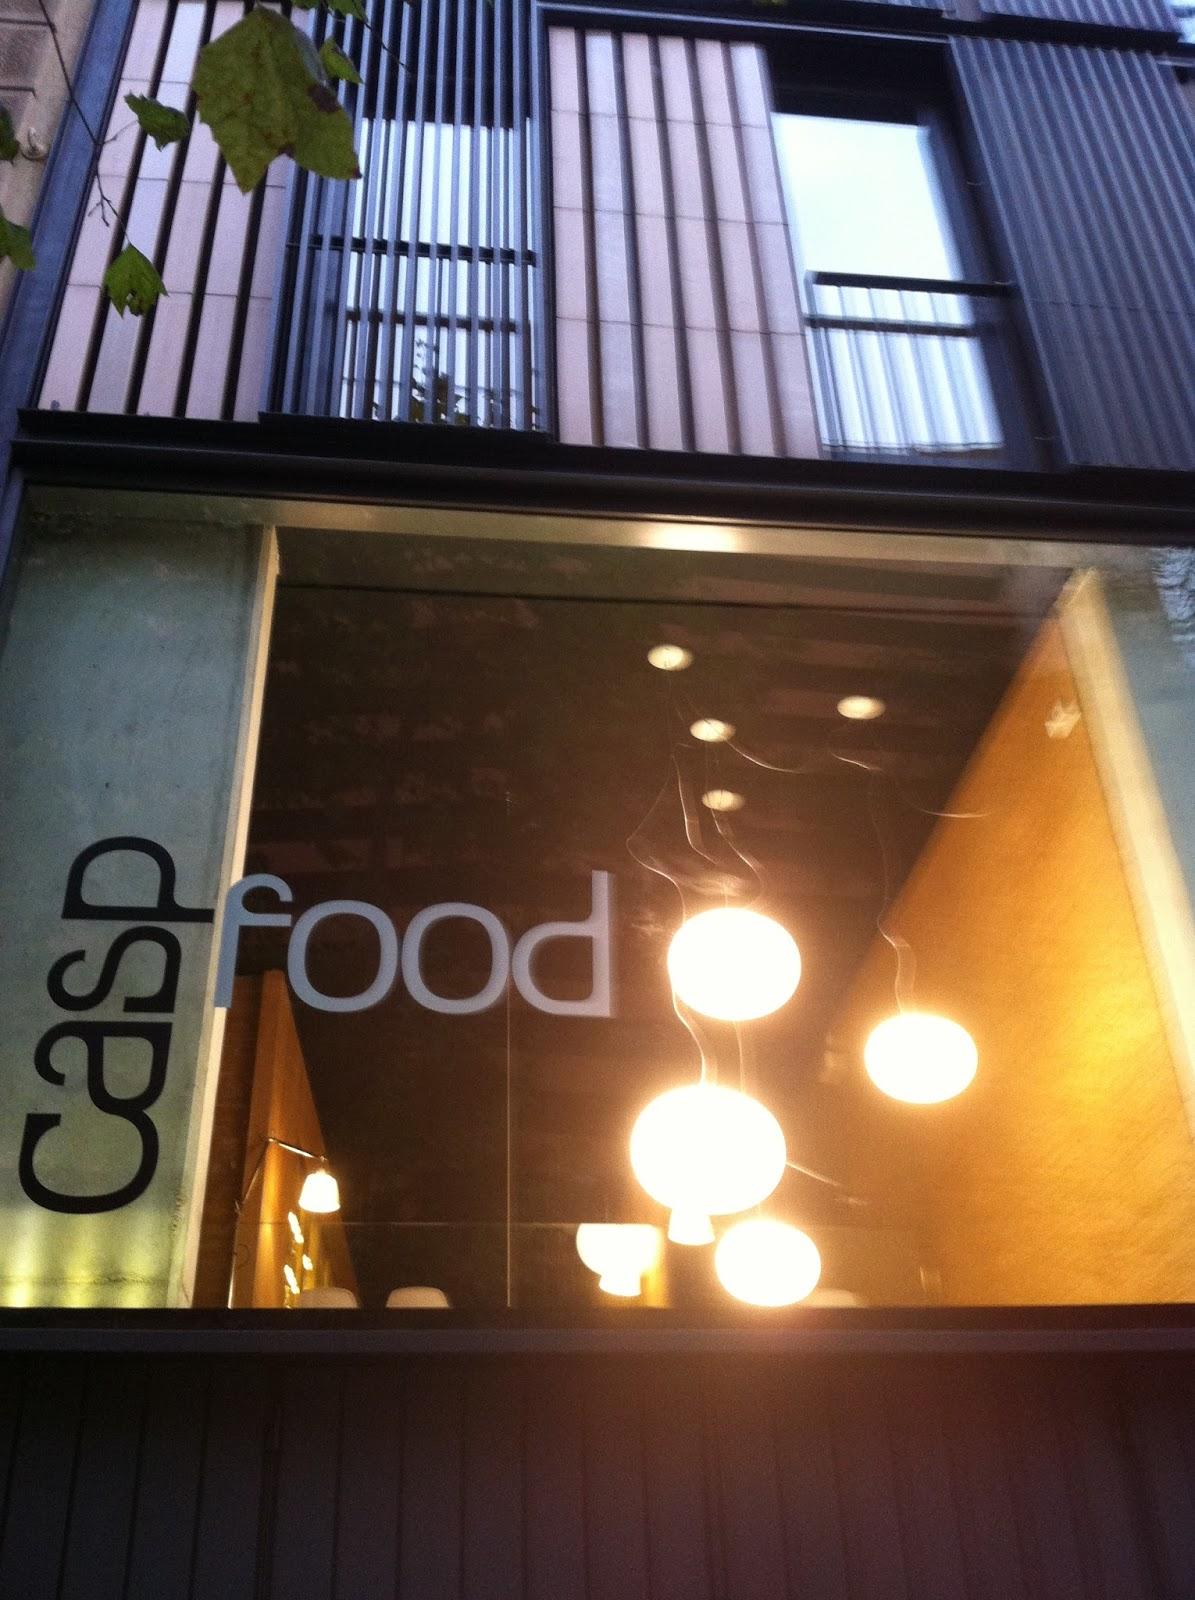 Trucos para optimizar mi hogar caspfood gourmet tienda - Calle casp barcelona ...